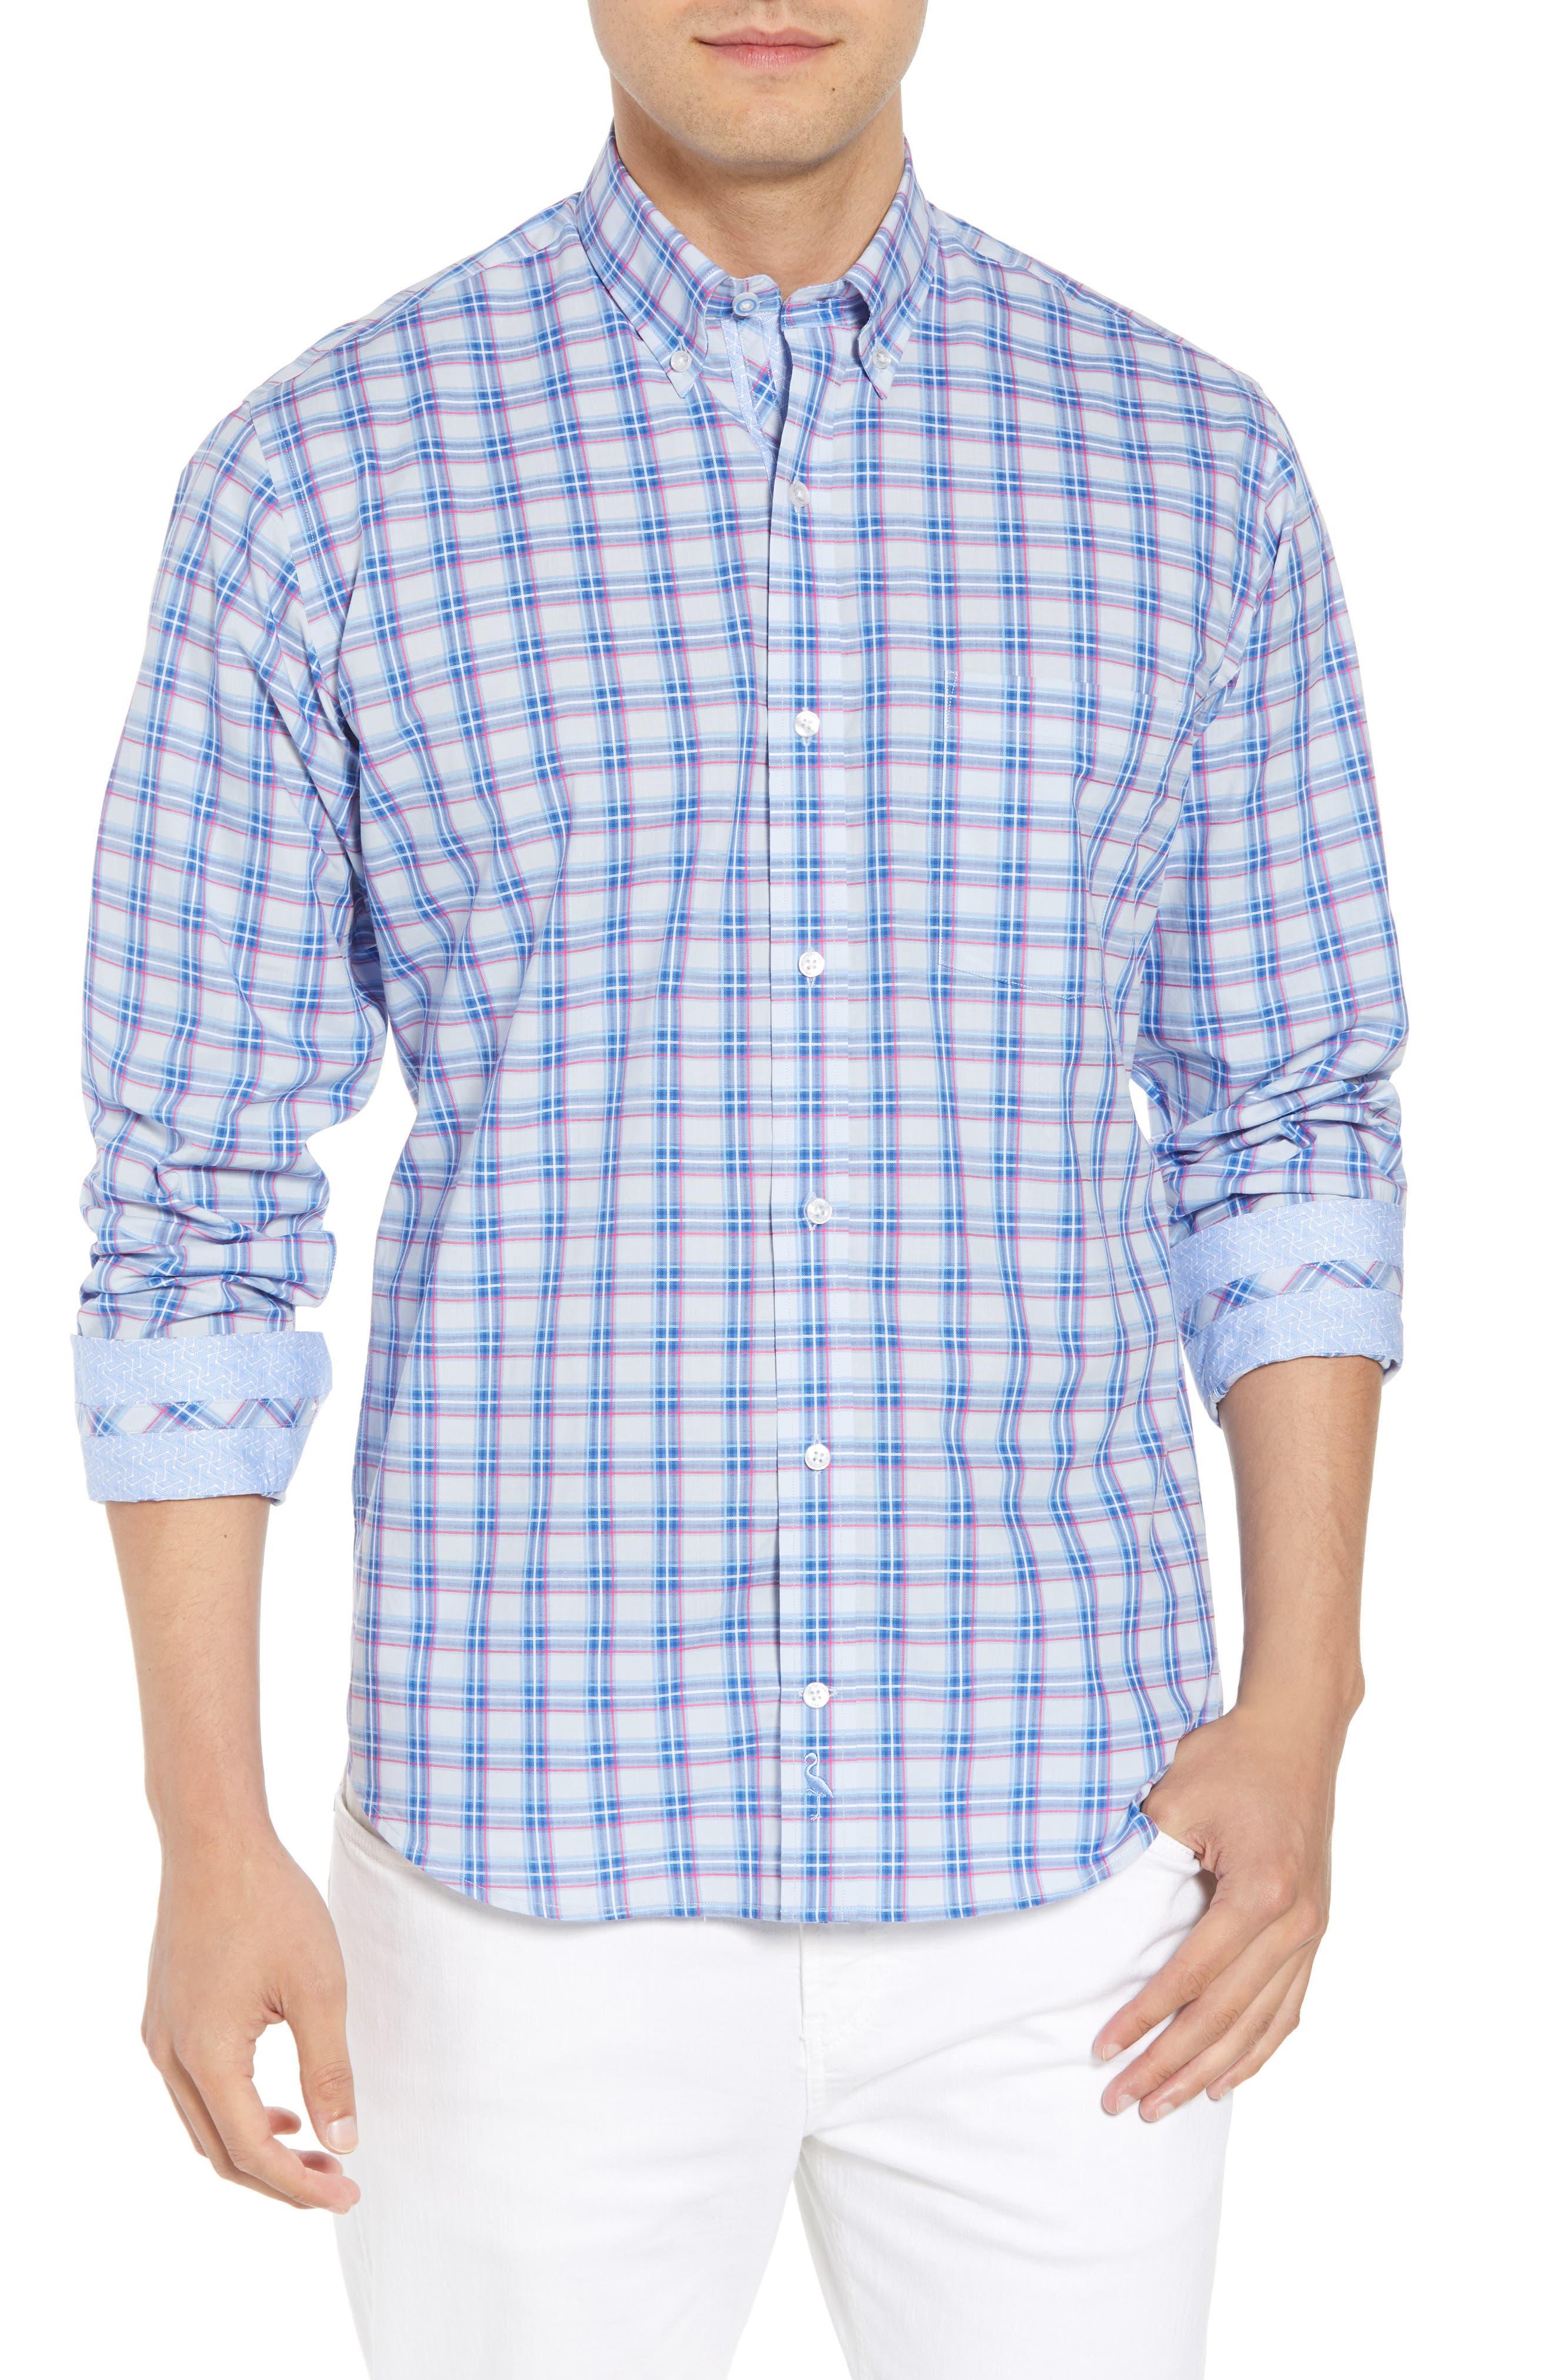 Alvaro Regular Fit Plaid Sport Shirt,                         Main,                         color, Light Blue